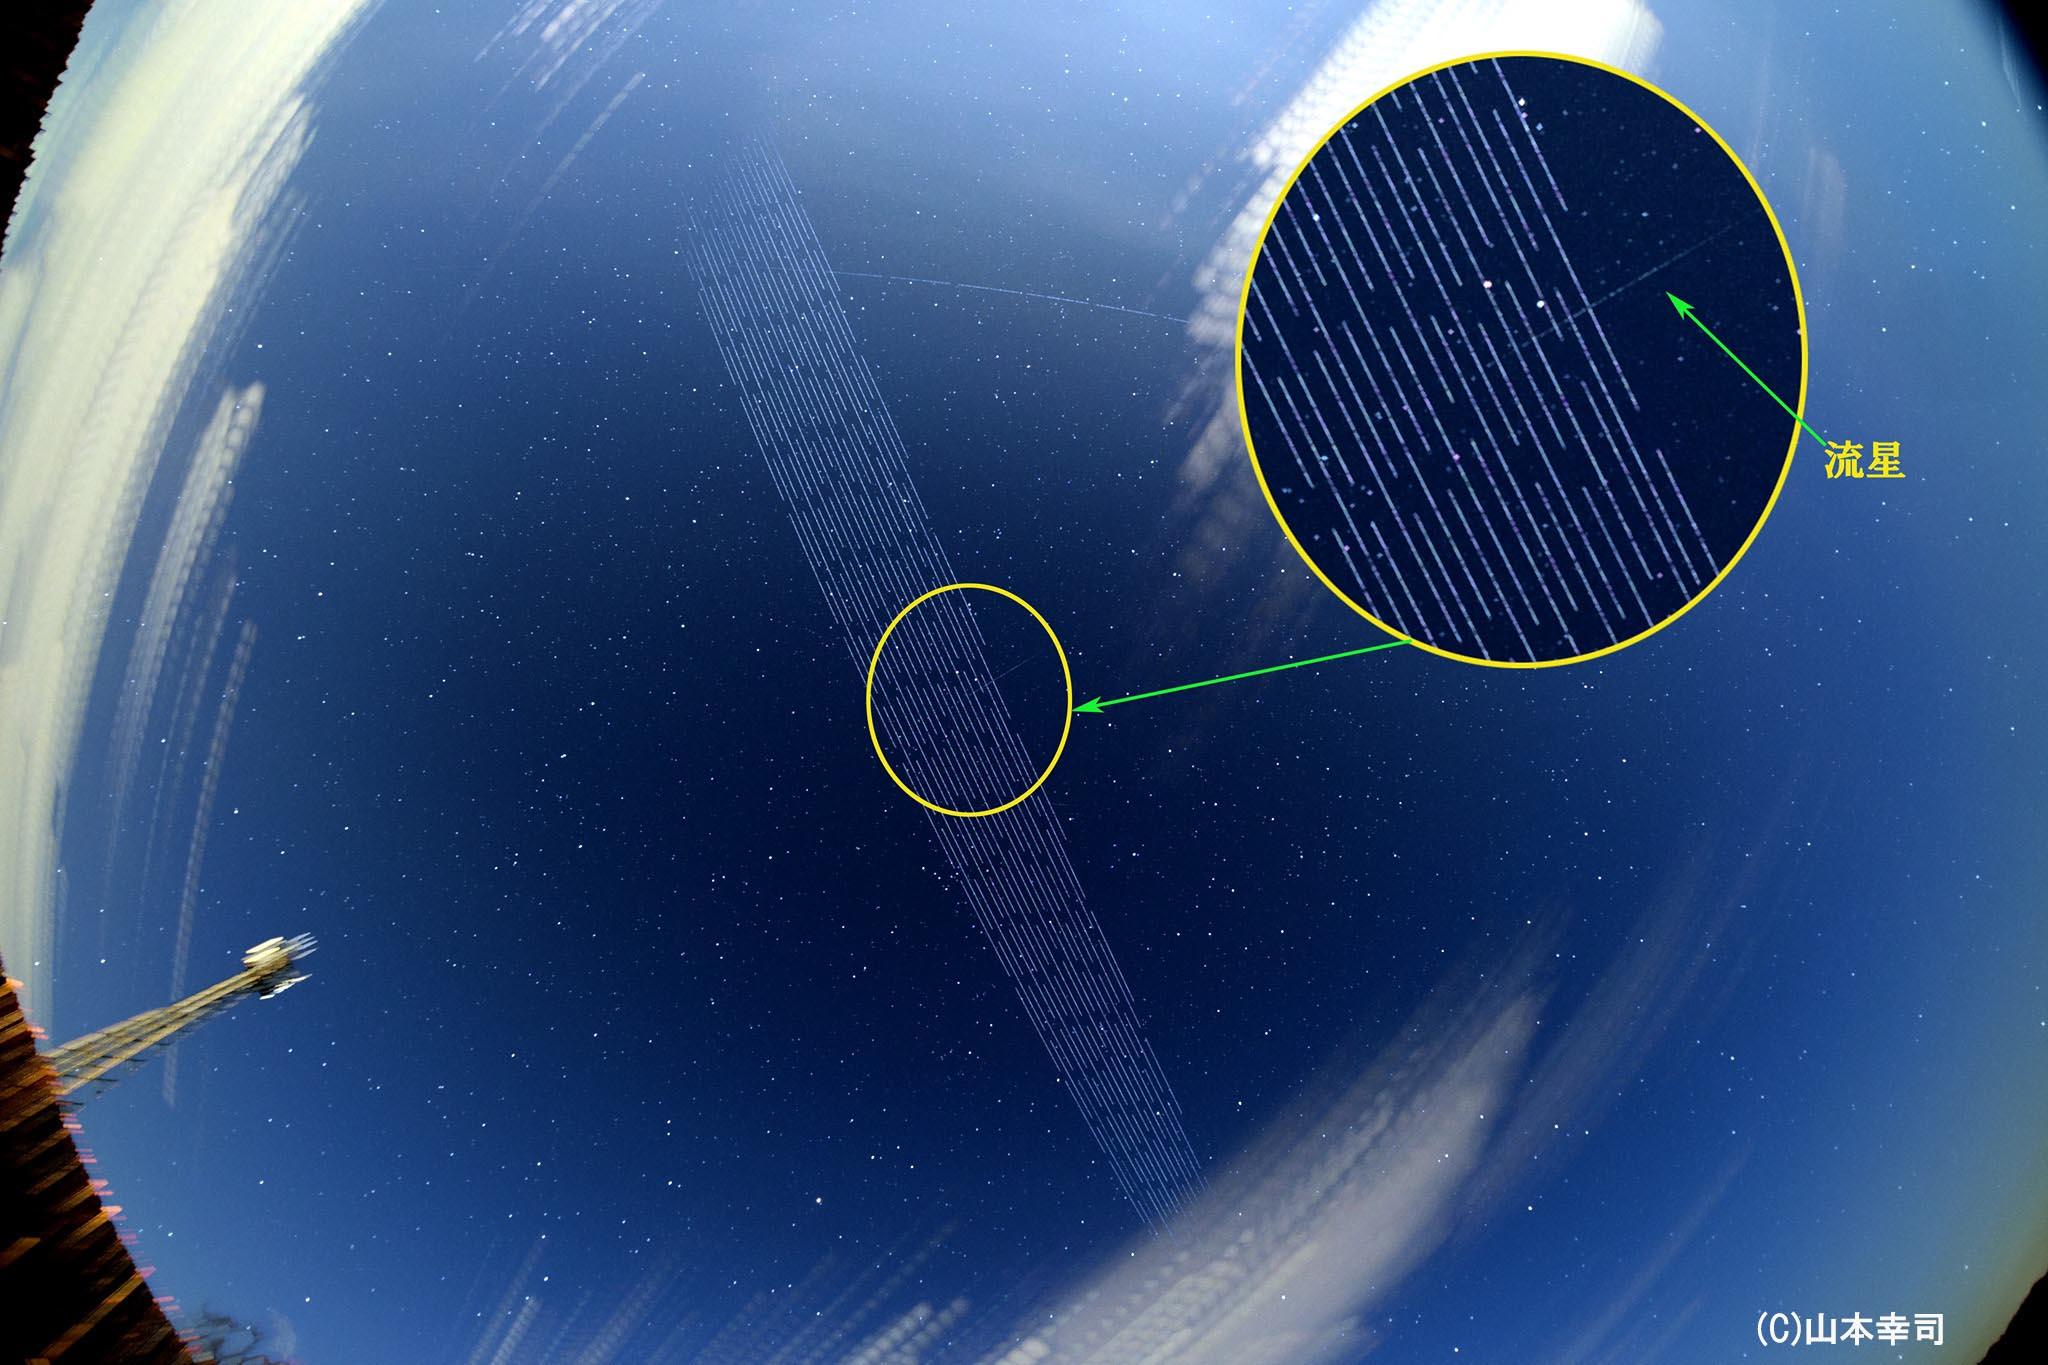 Starlink(スターリンク)衛星の天体観測への影響 | 天リフギャラリー